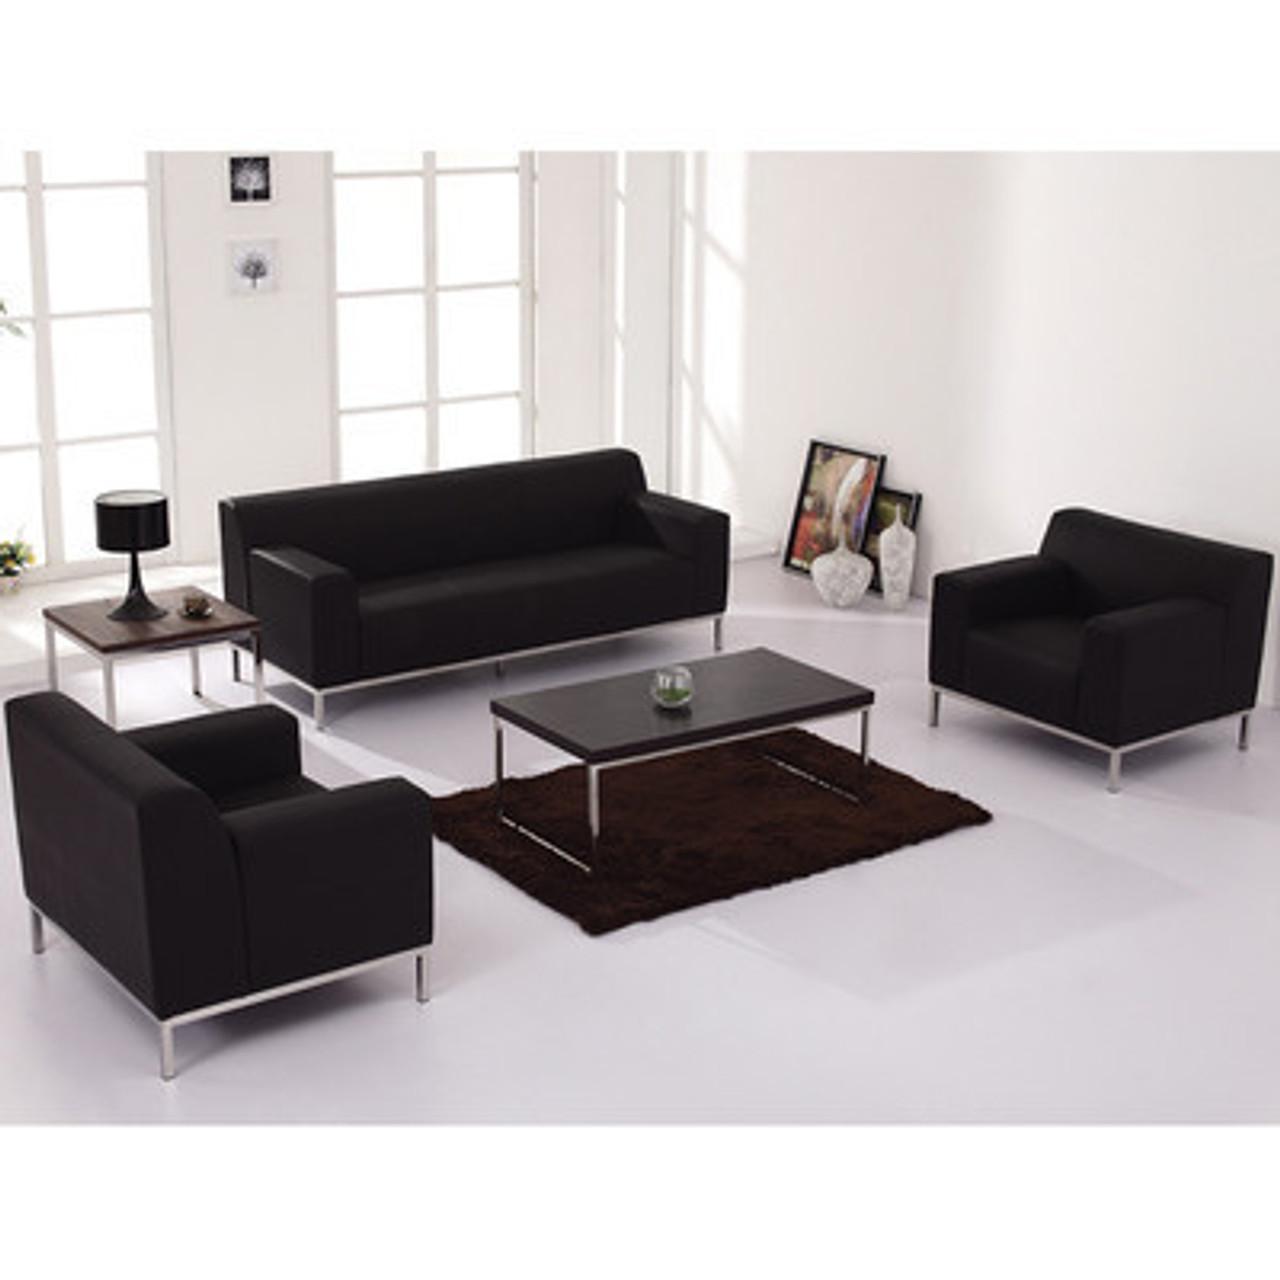 3pc Modern Leather Office Reception Sofa Set, FF-0444-12-S1